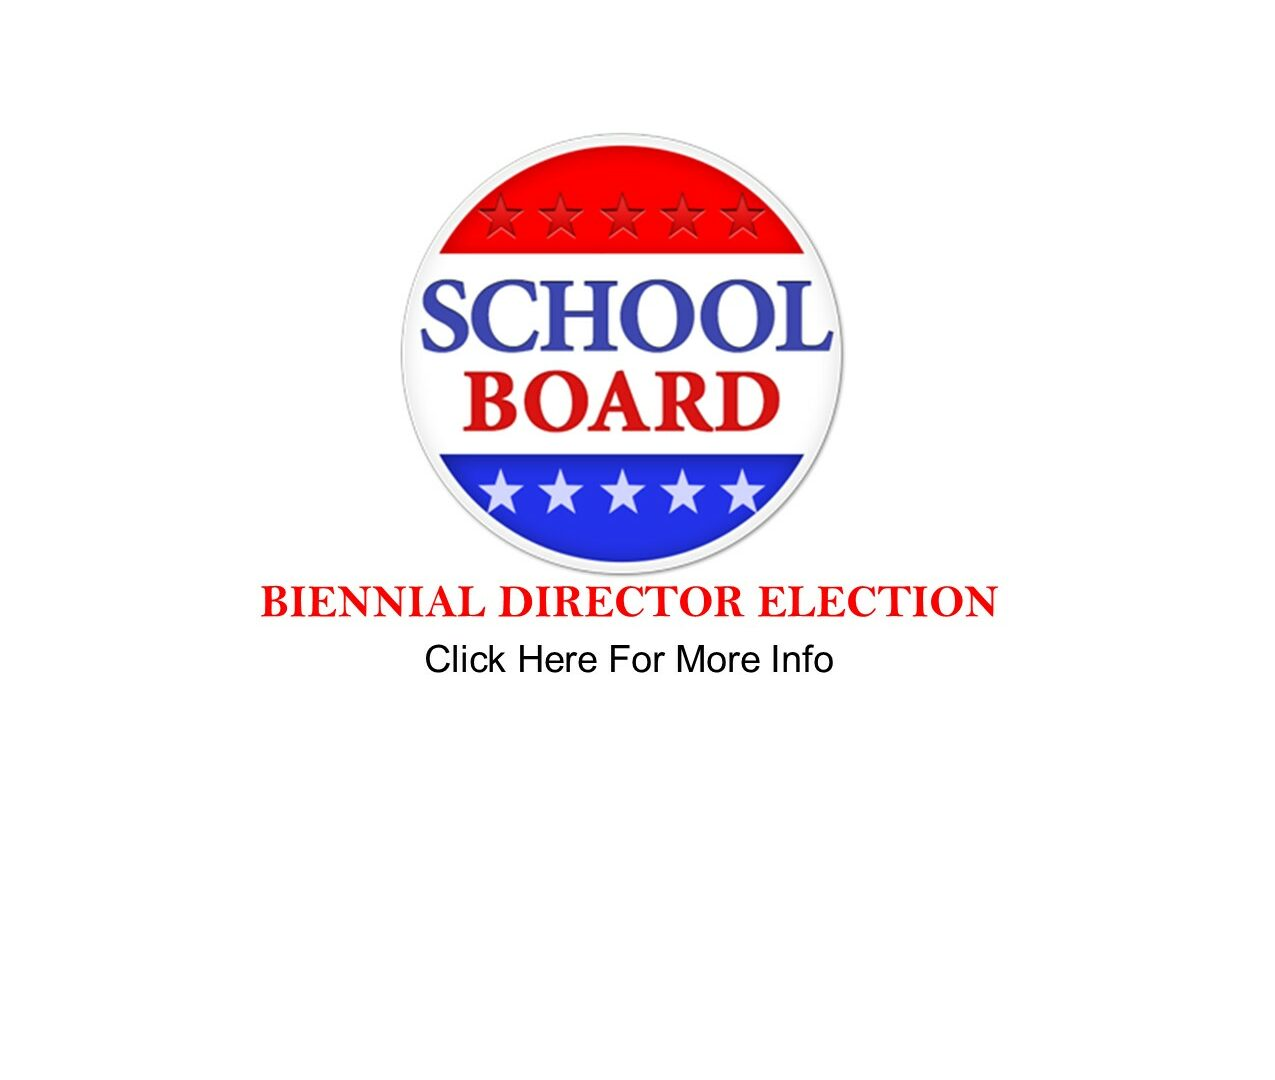 Biennial Director Election